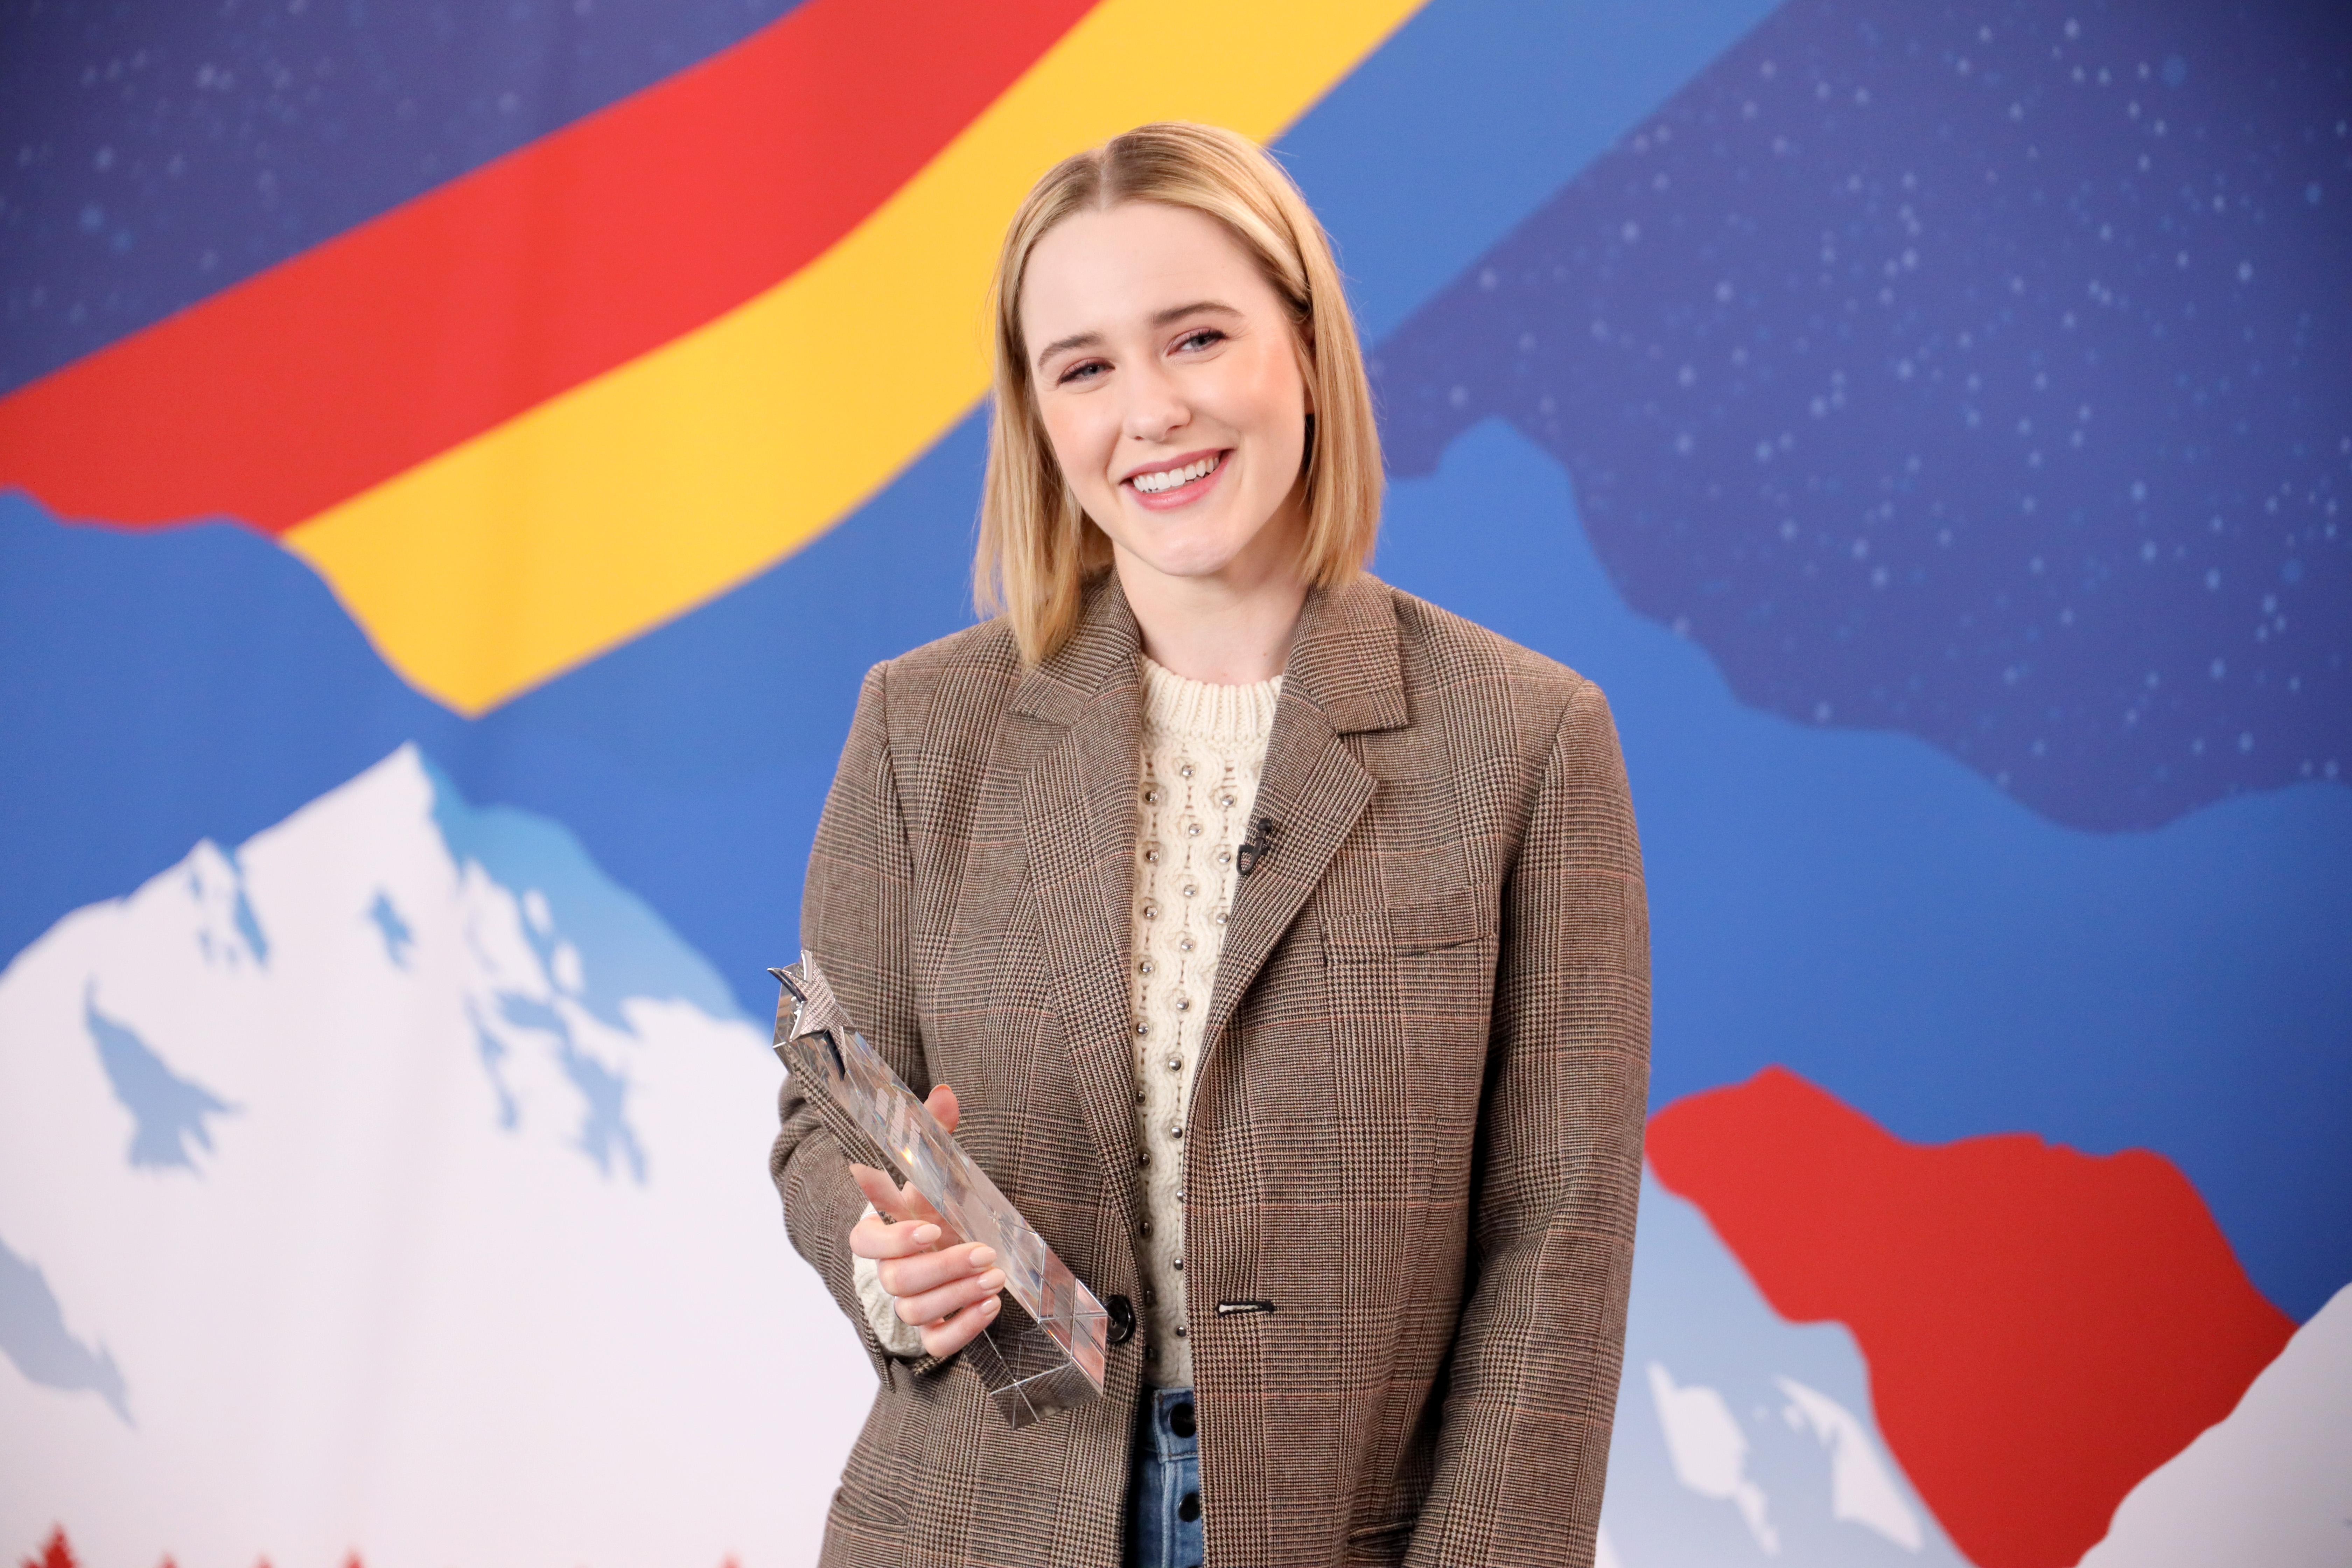 Rachel Brosnahan at an event for The IMDb Studio at Acura Festival Village (2020)